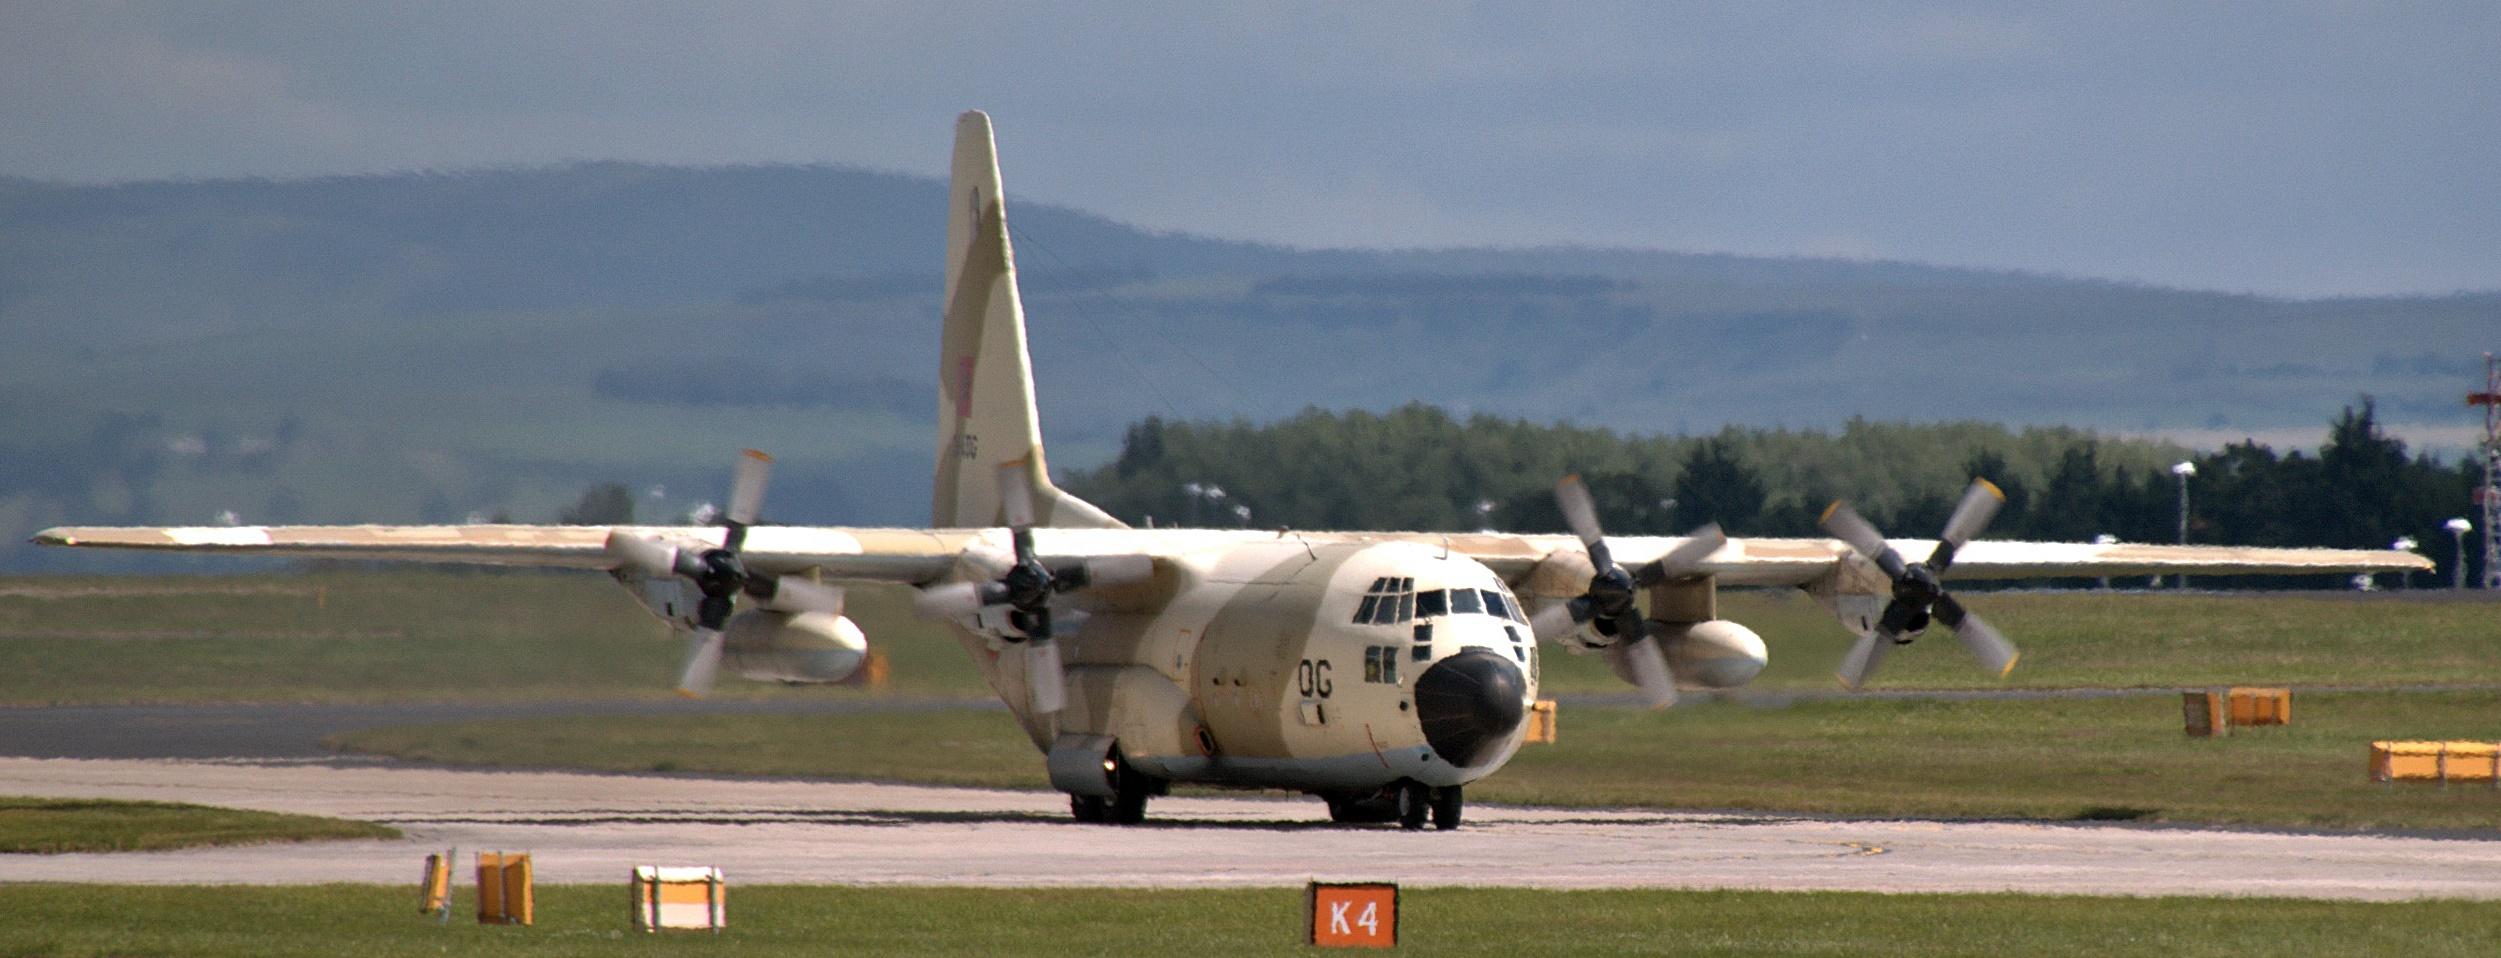 FRA: Photos d'avions de transport - Page 31 35711939642_c0c8ac4c60_o